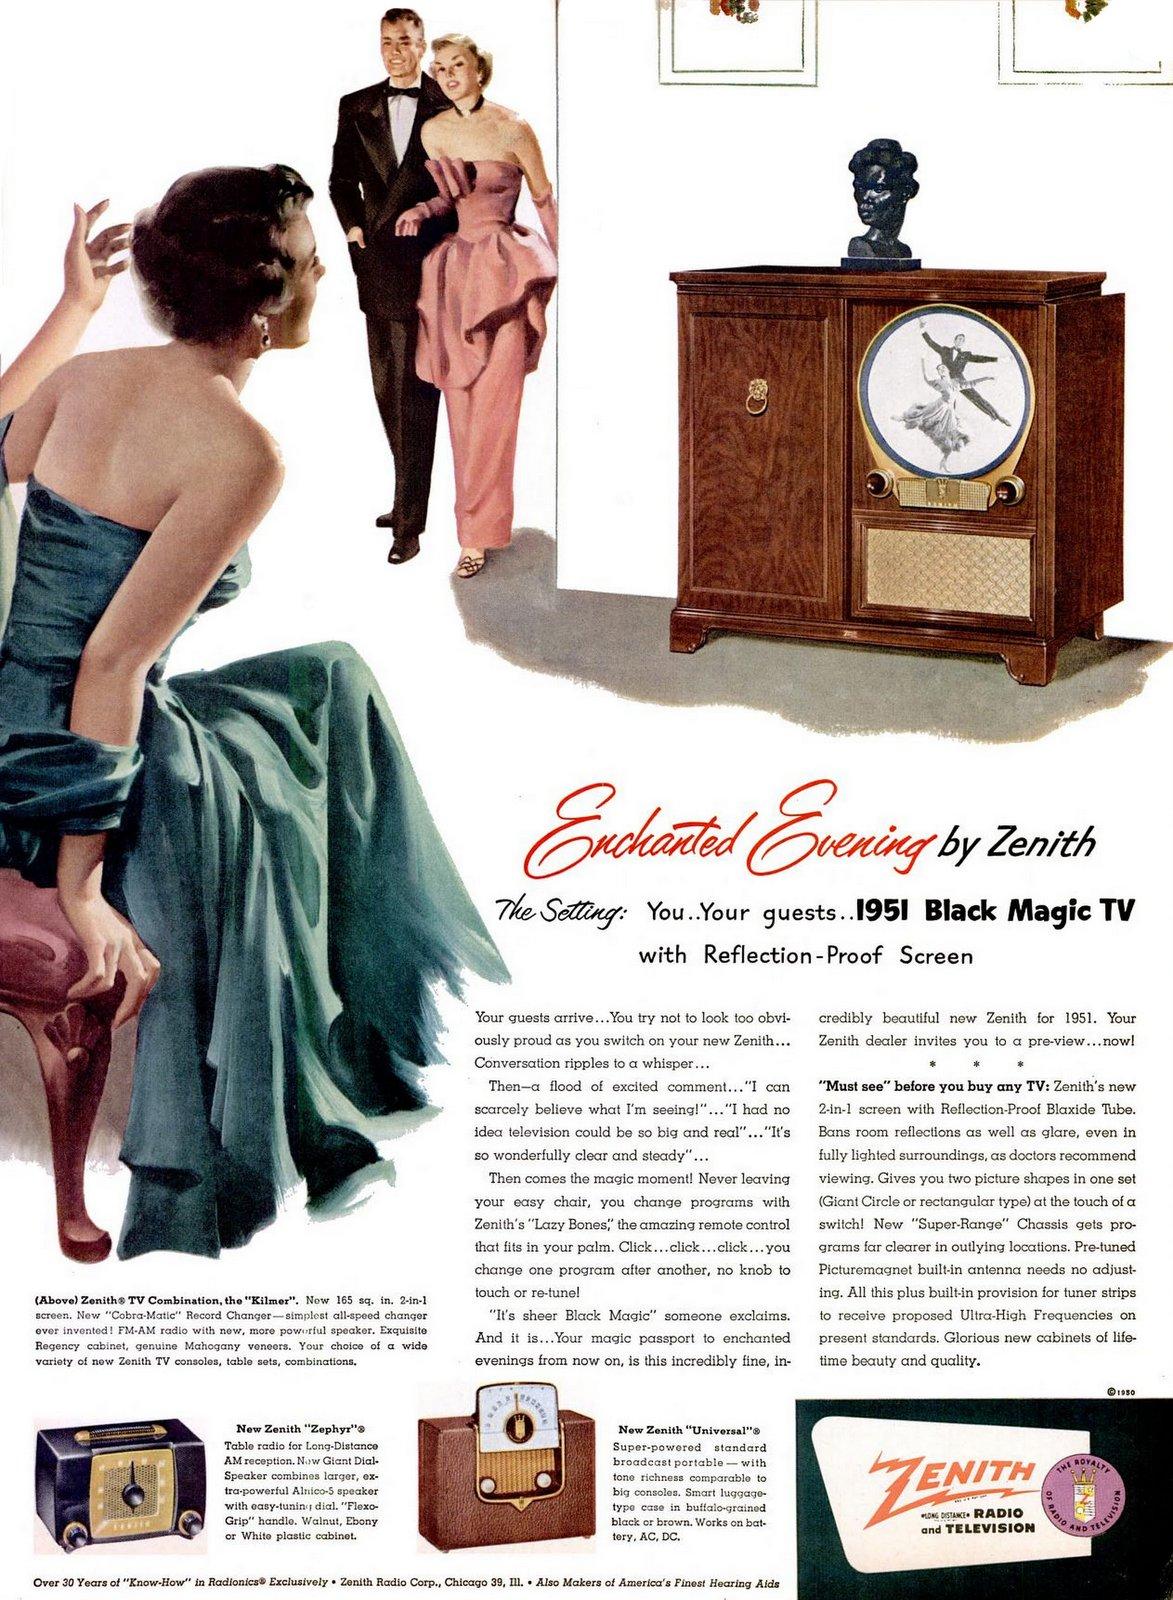 LIFE Nov 6, 1950 Zenith Black Magic round TV set